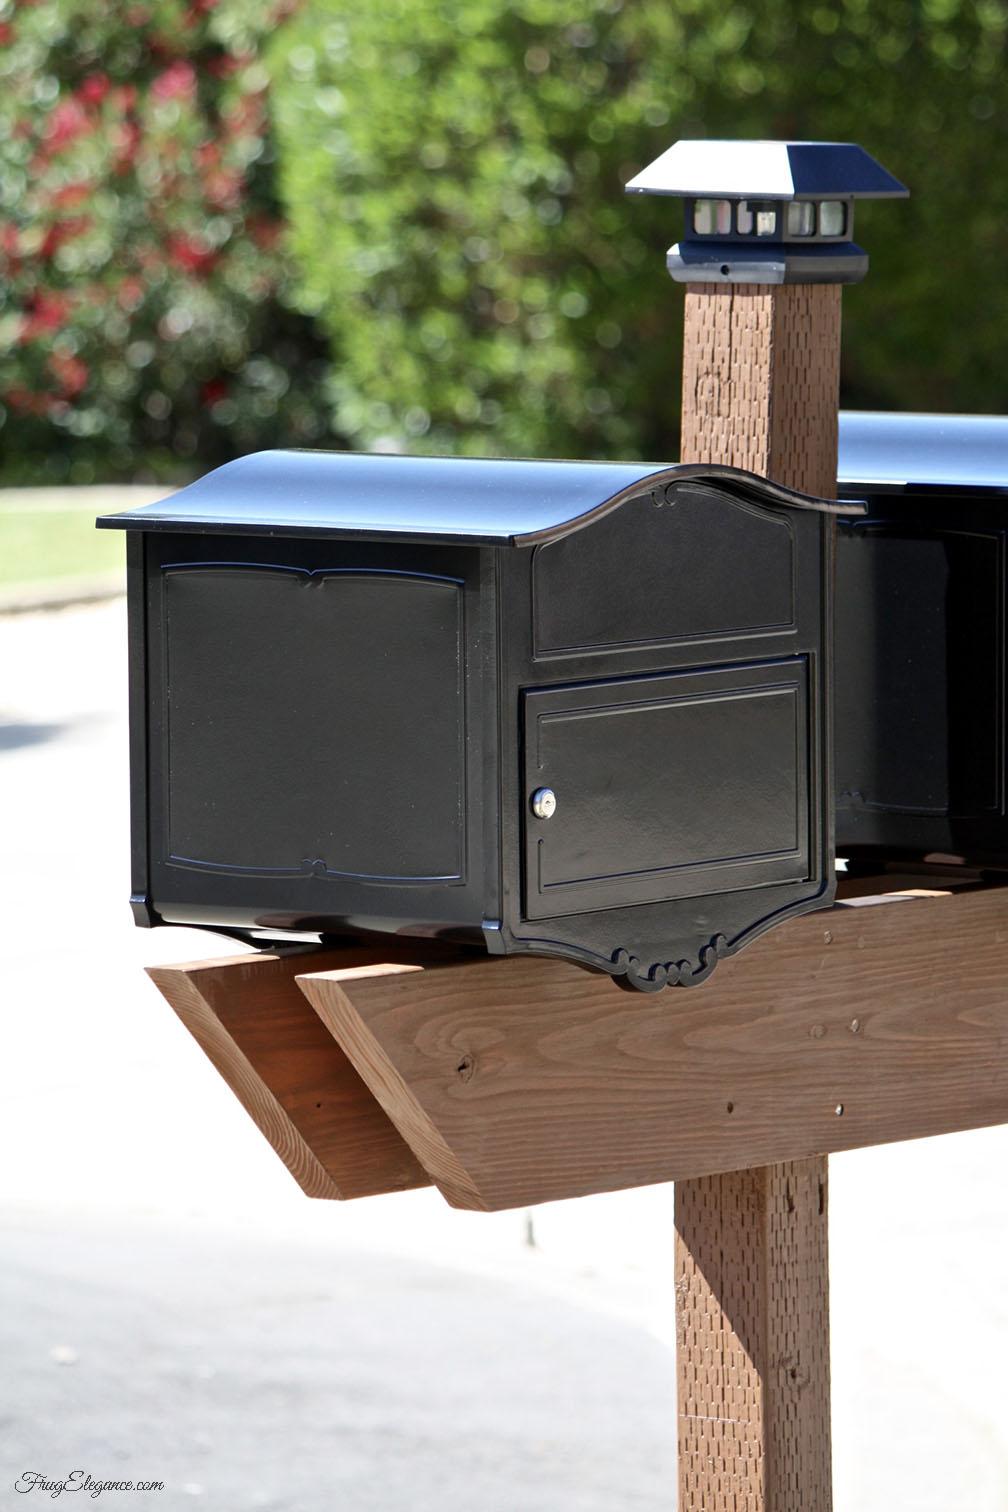 Lockable mailboxes